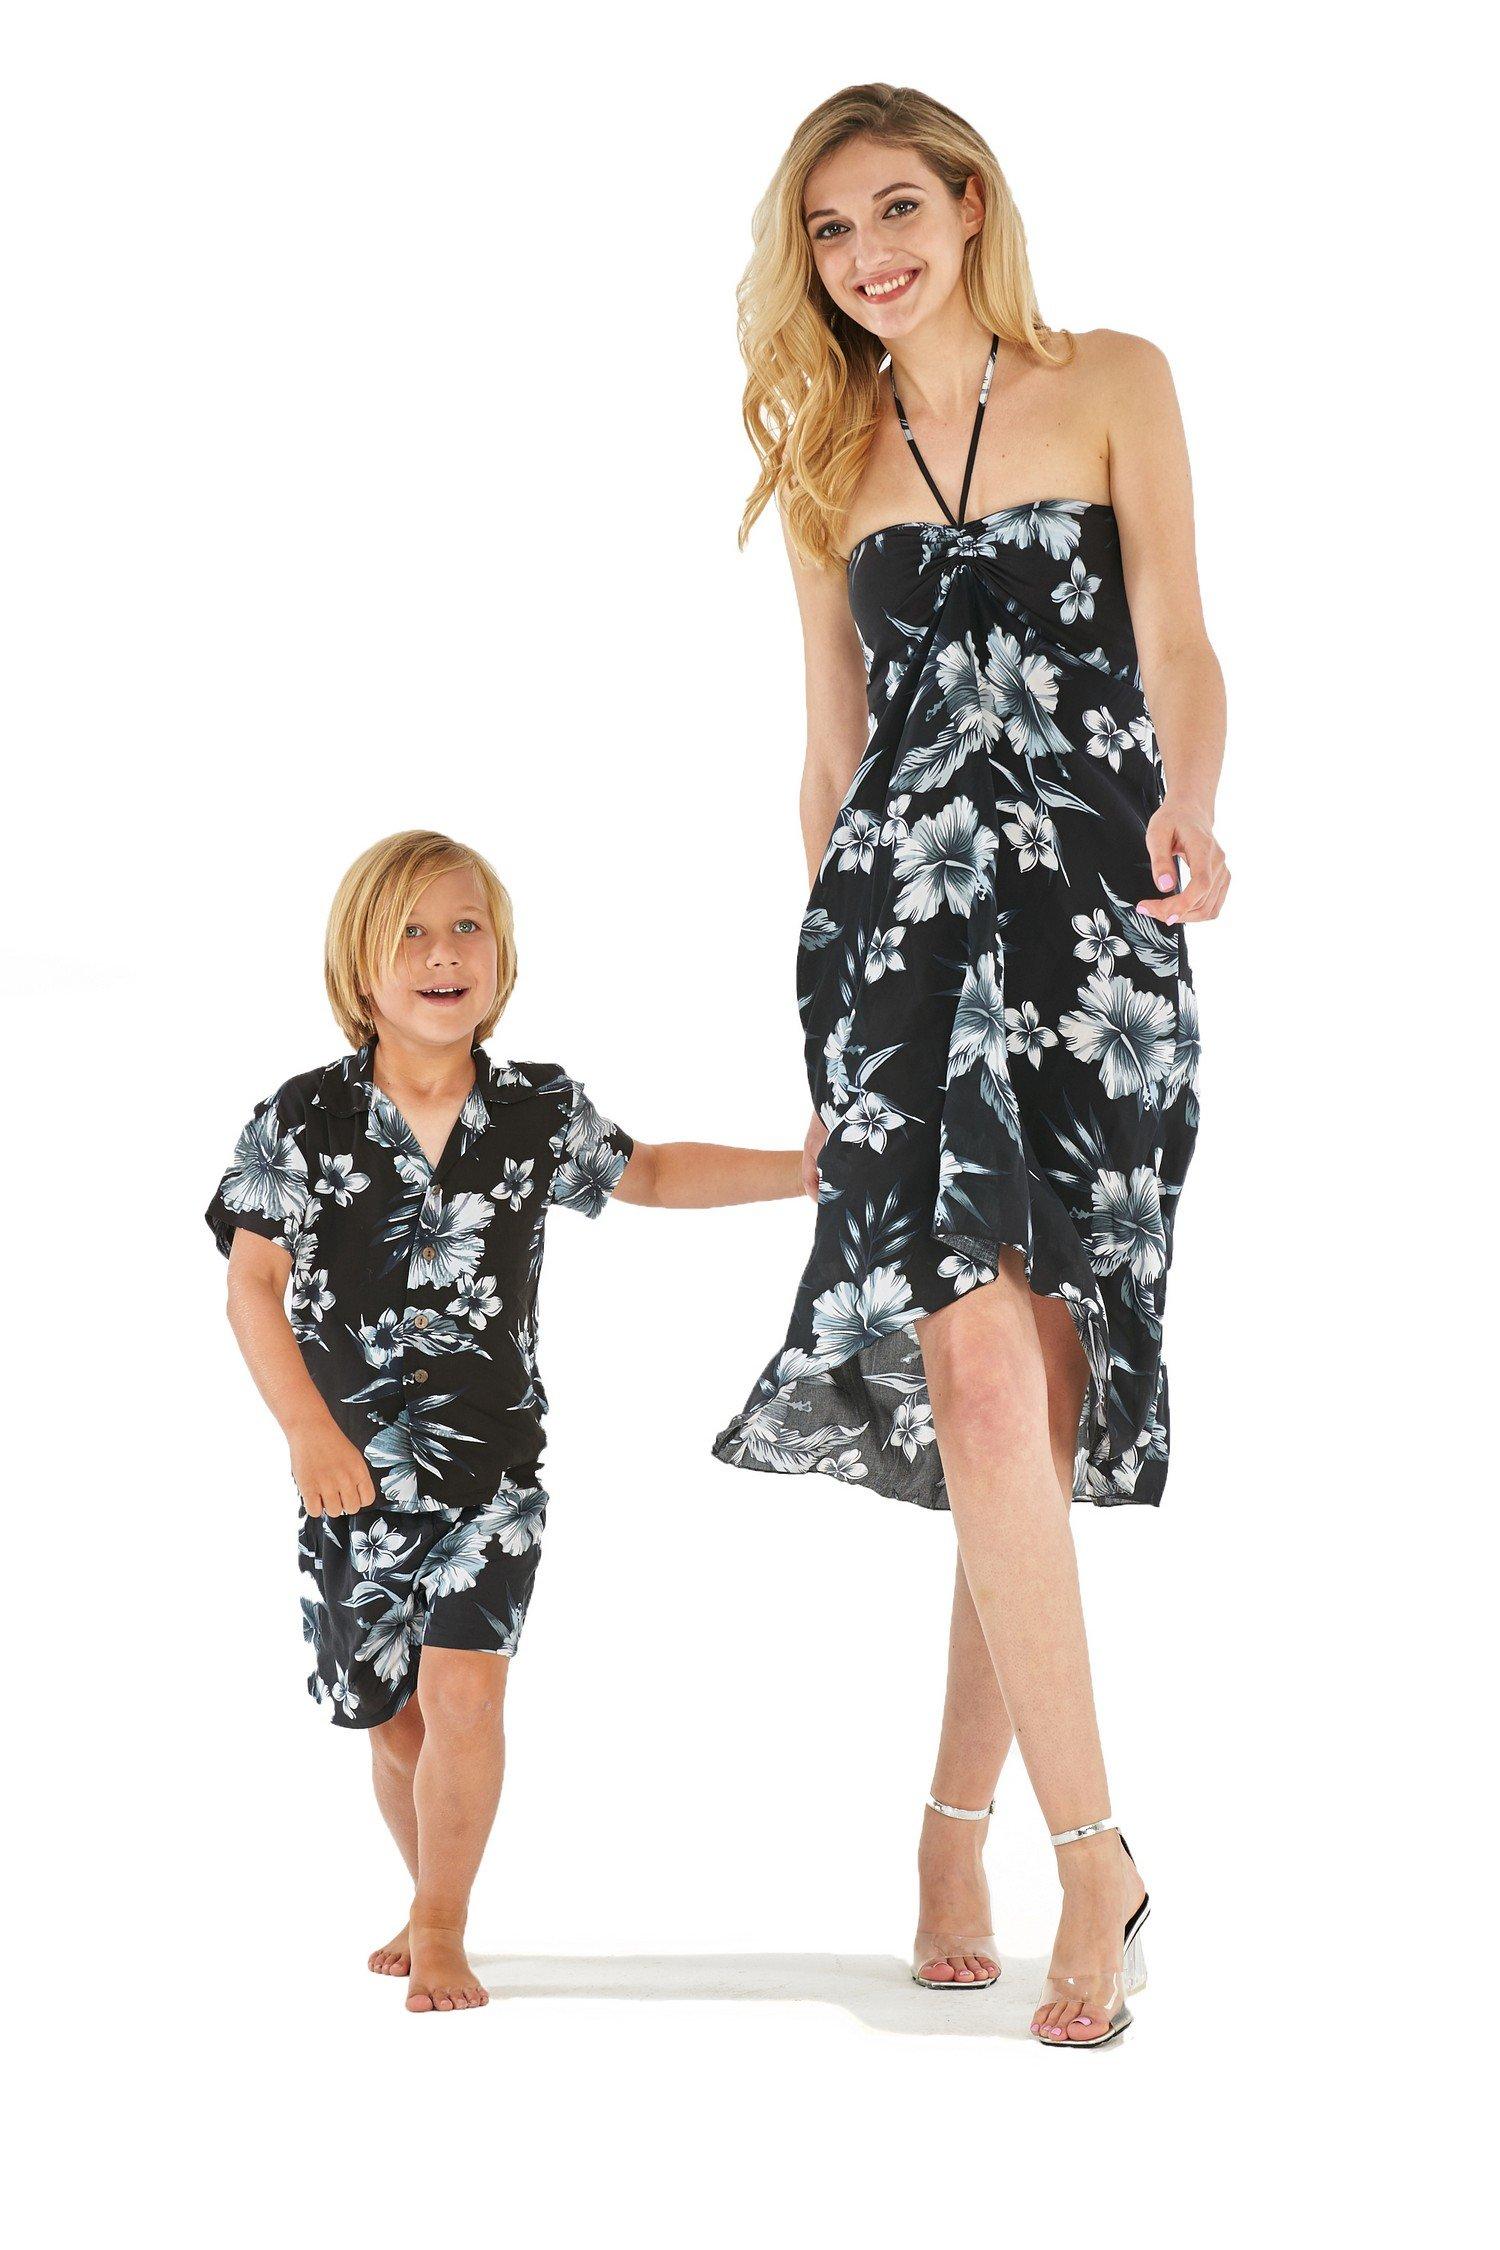 Matching Mother Son Hawaiian Luau Outfit Dress Shirt in Midnight Bloom Women M Boy 8